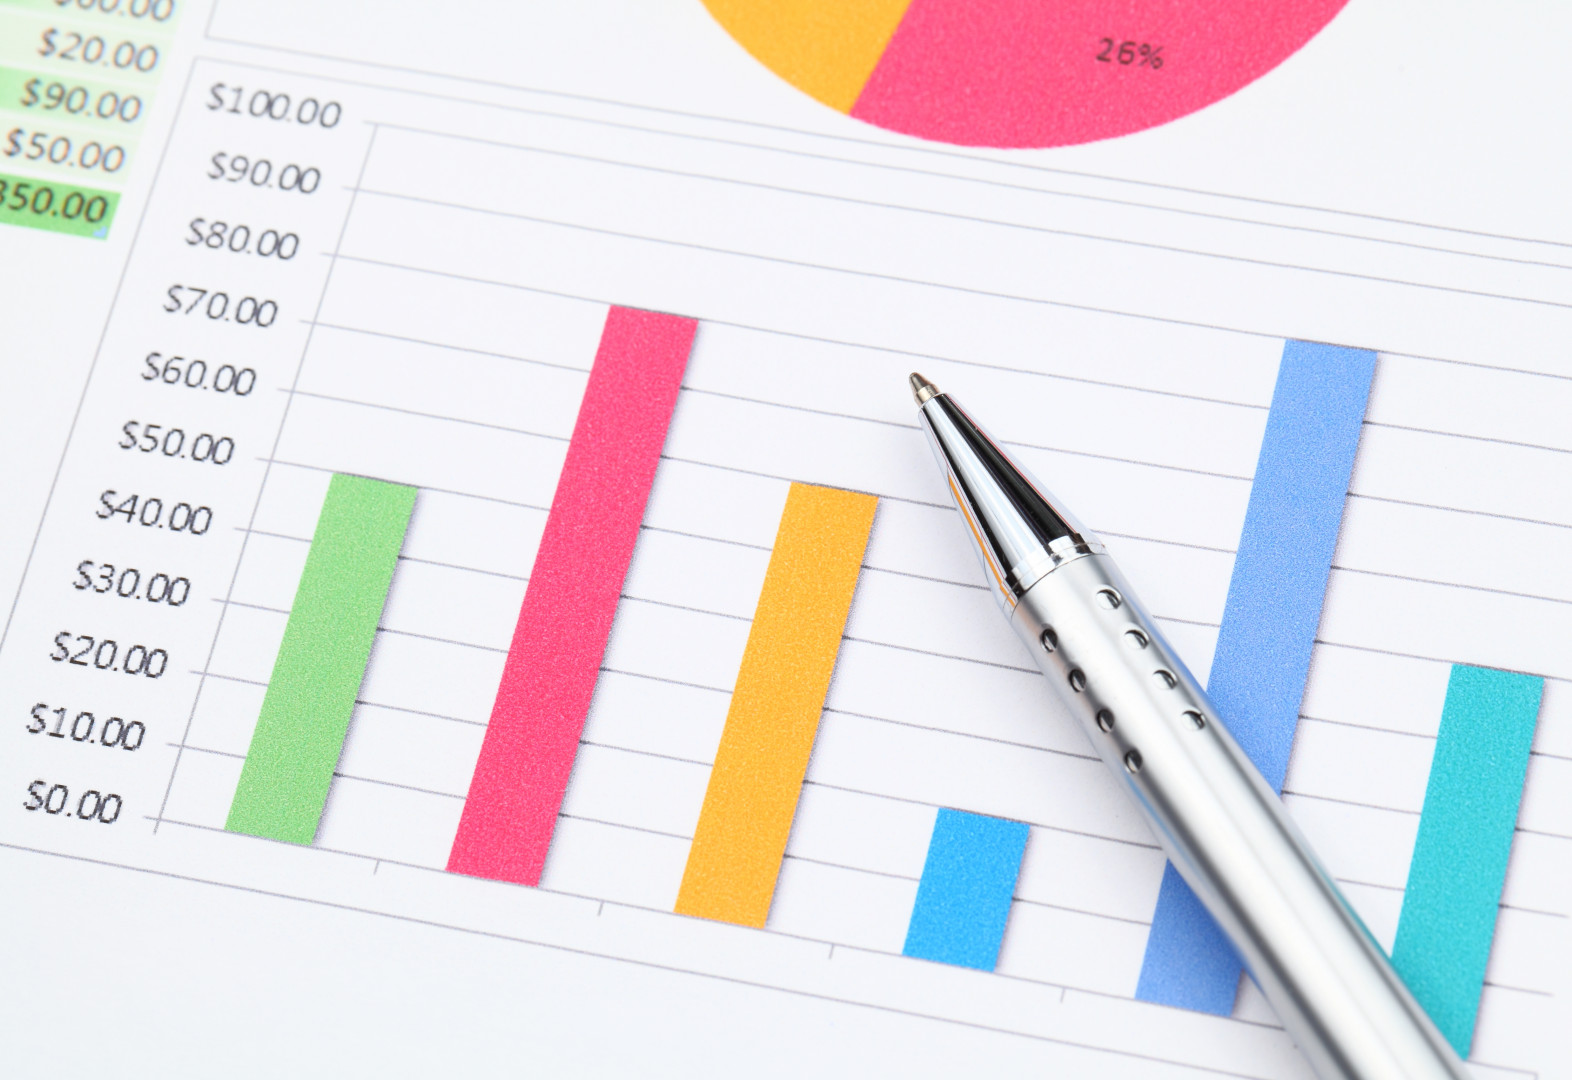 Residential Stats for June 2016